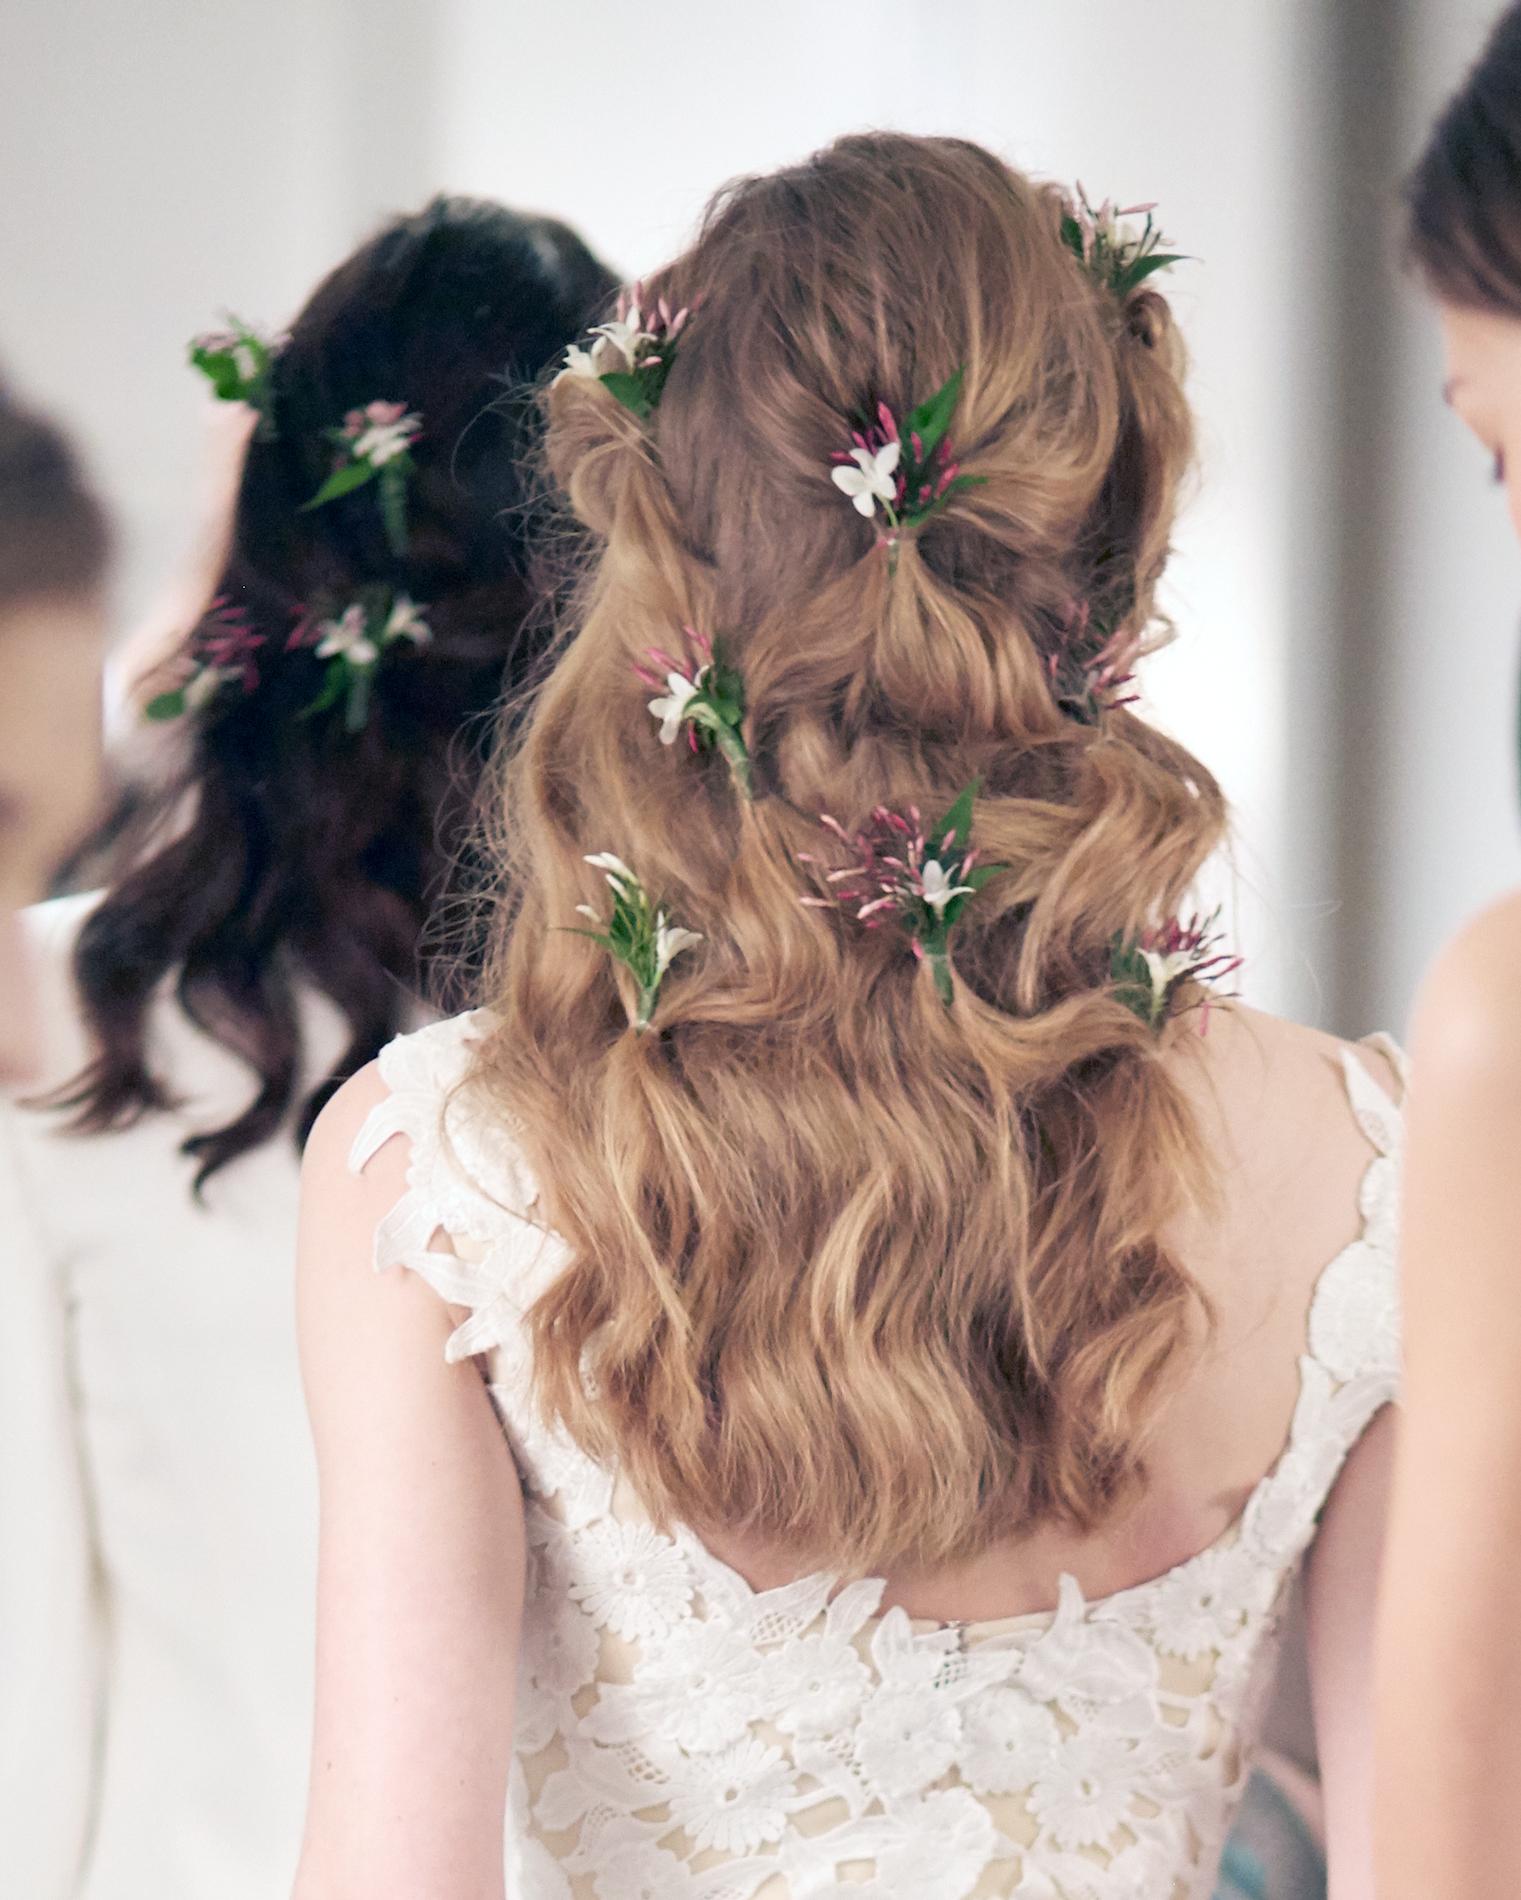 textured-hair-carolina-herrera-spring2016-bridal-show-0515.jpg